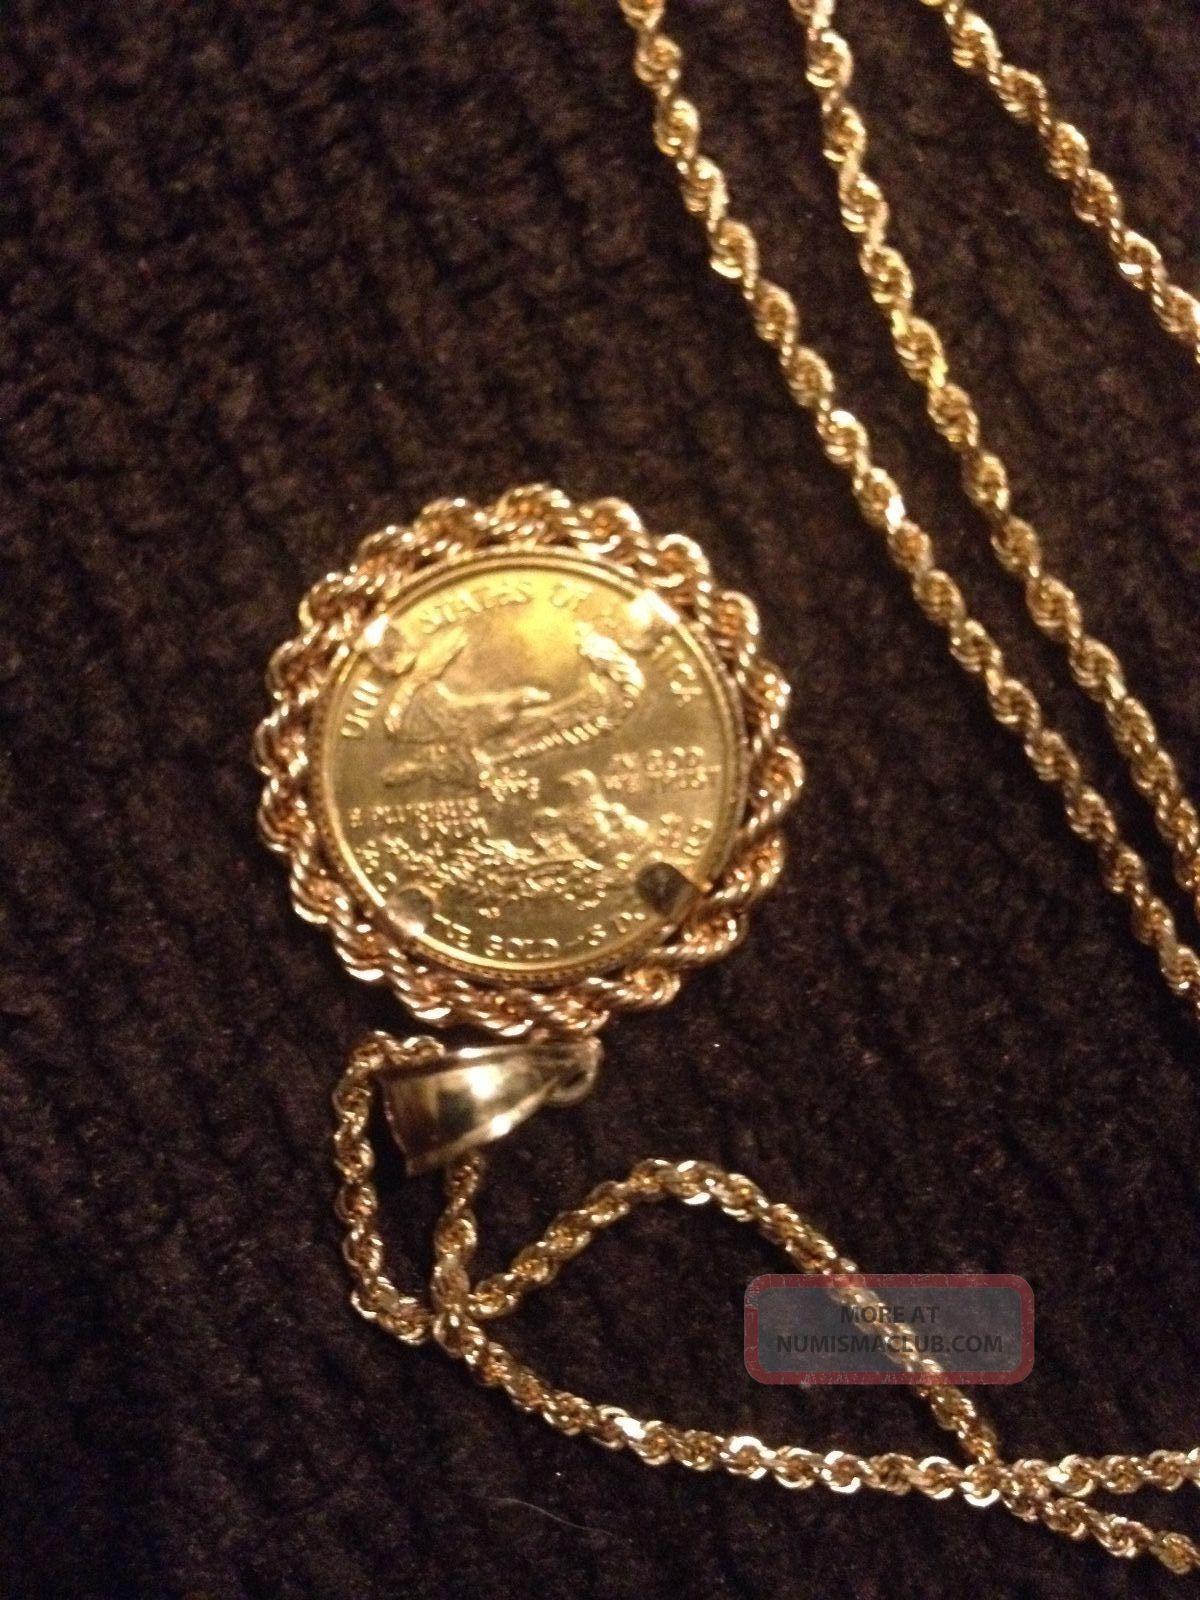 14k Yellow Gold Chain Necklace W Unique 1992 1 10th Oz